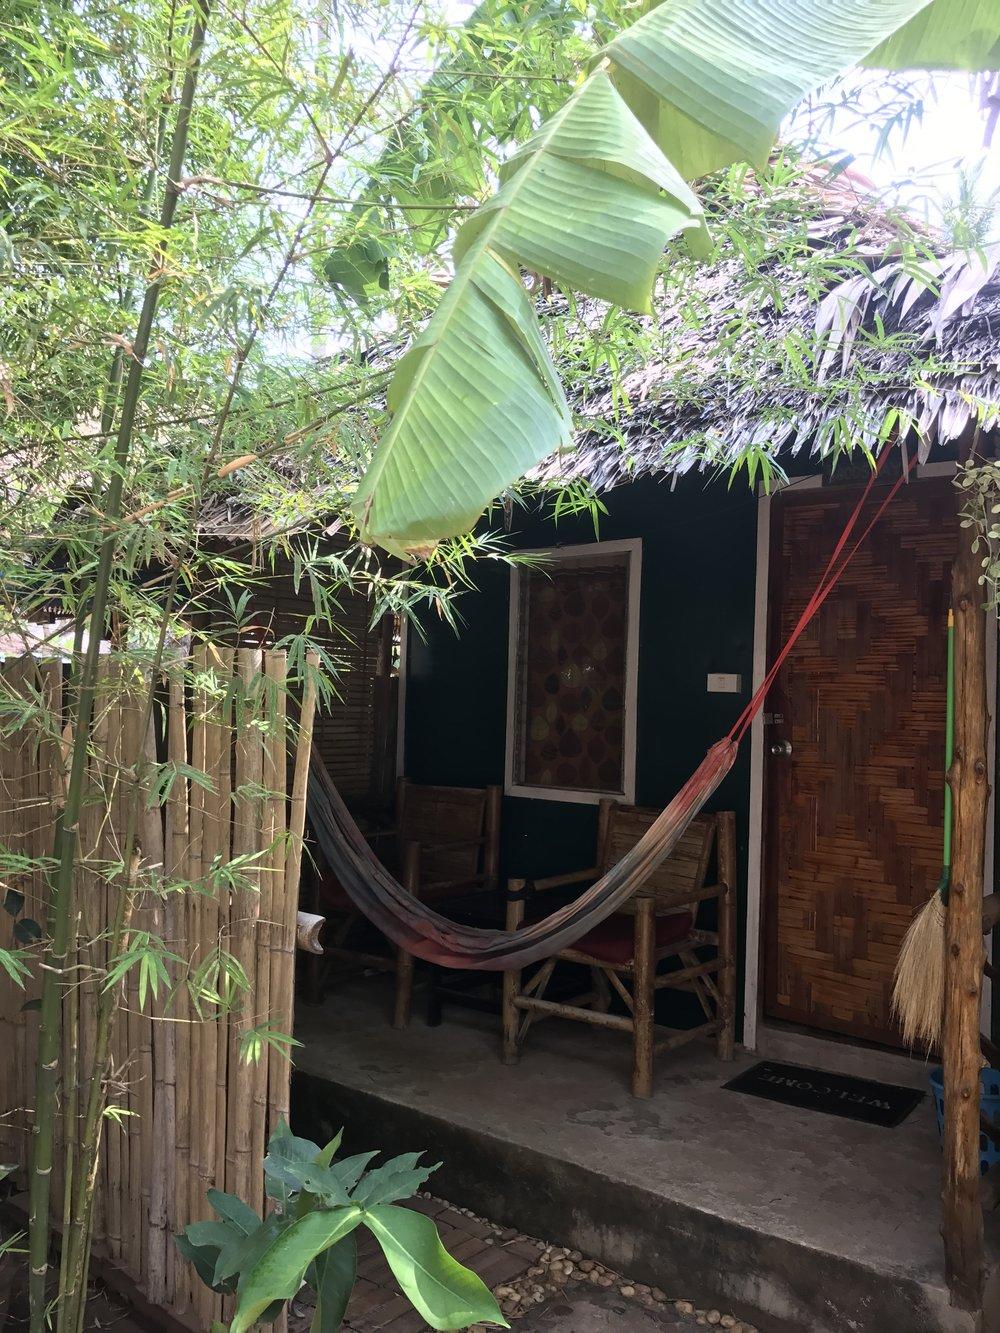 The Hut Lanta.